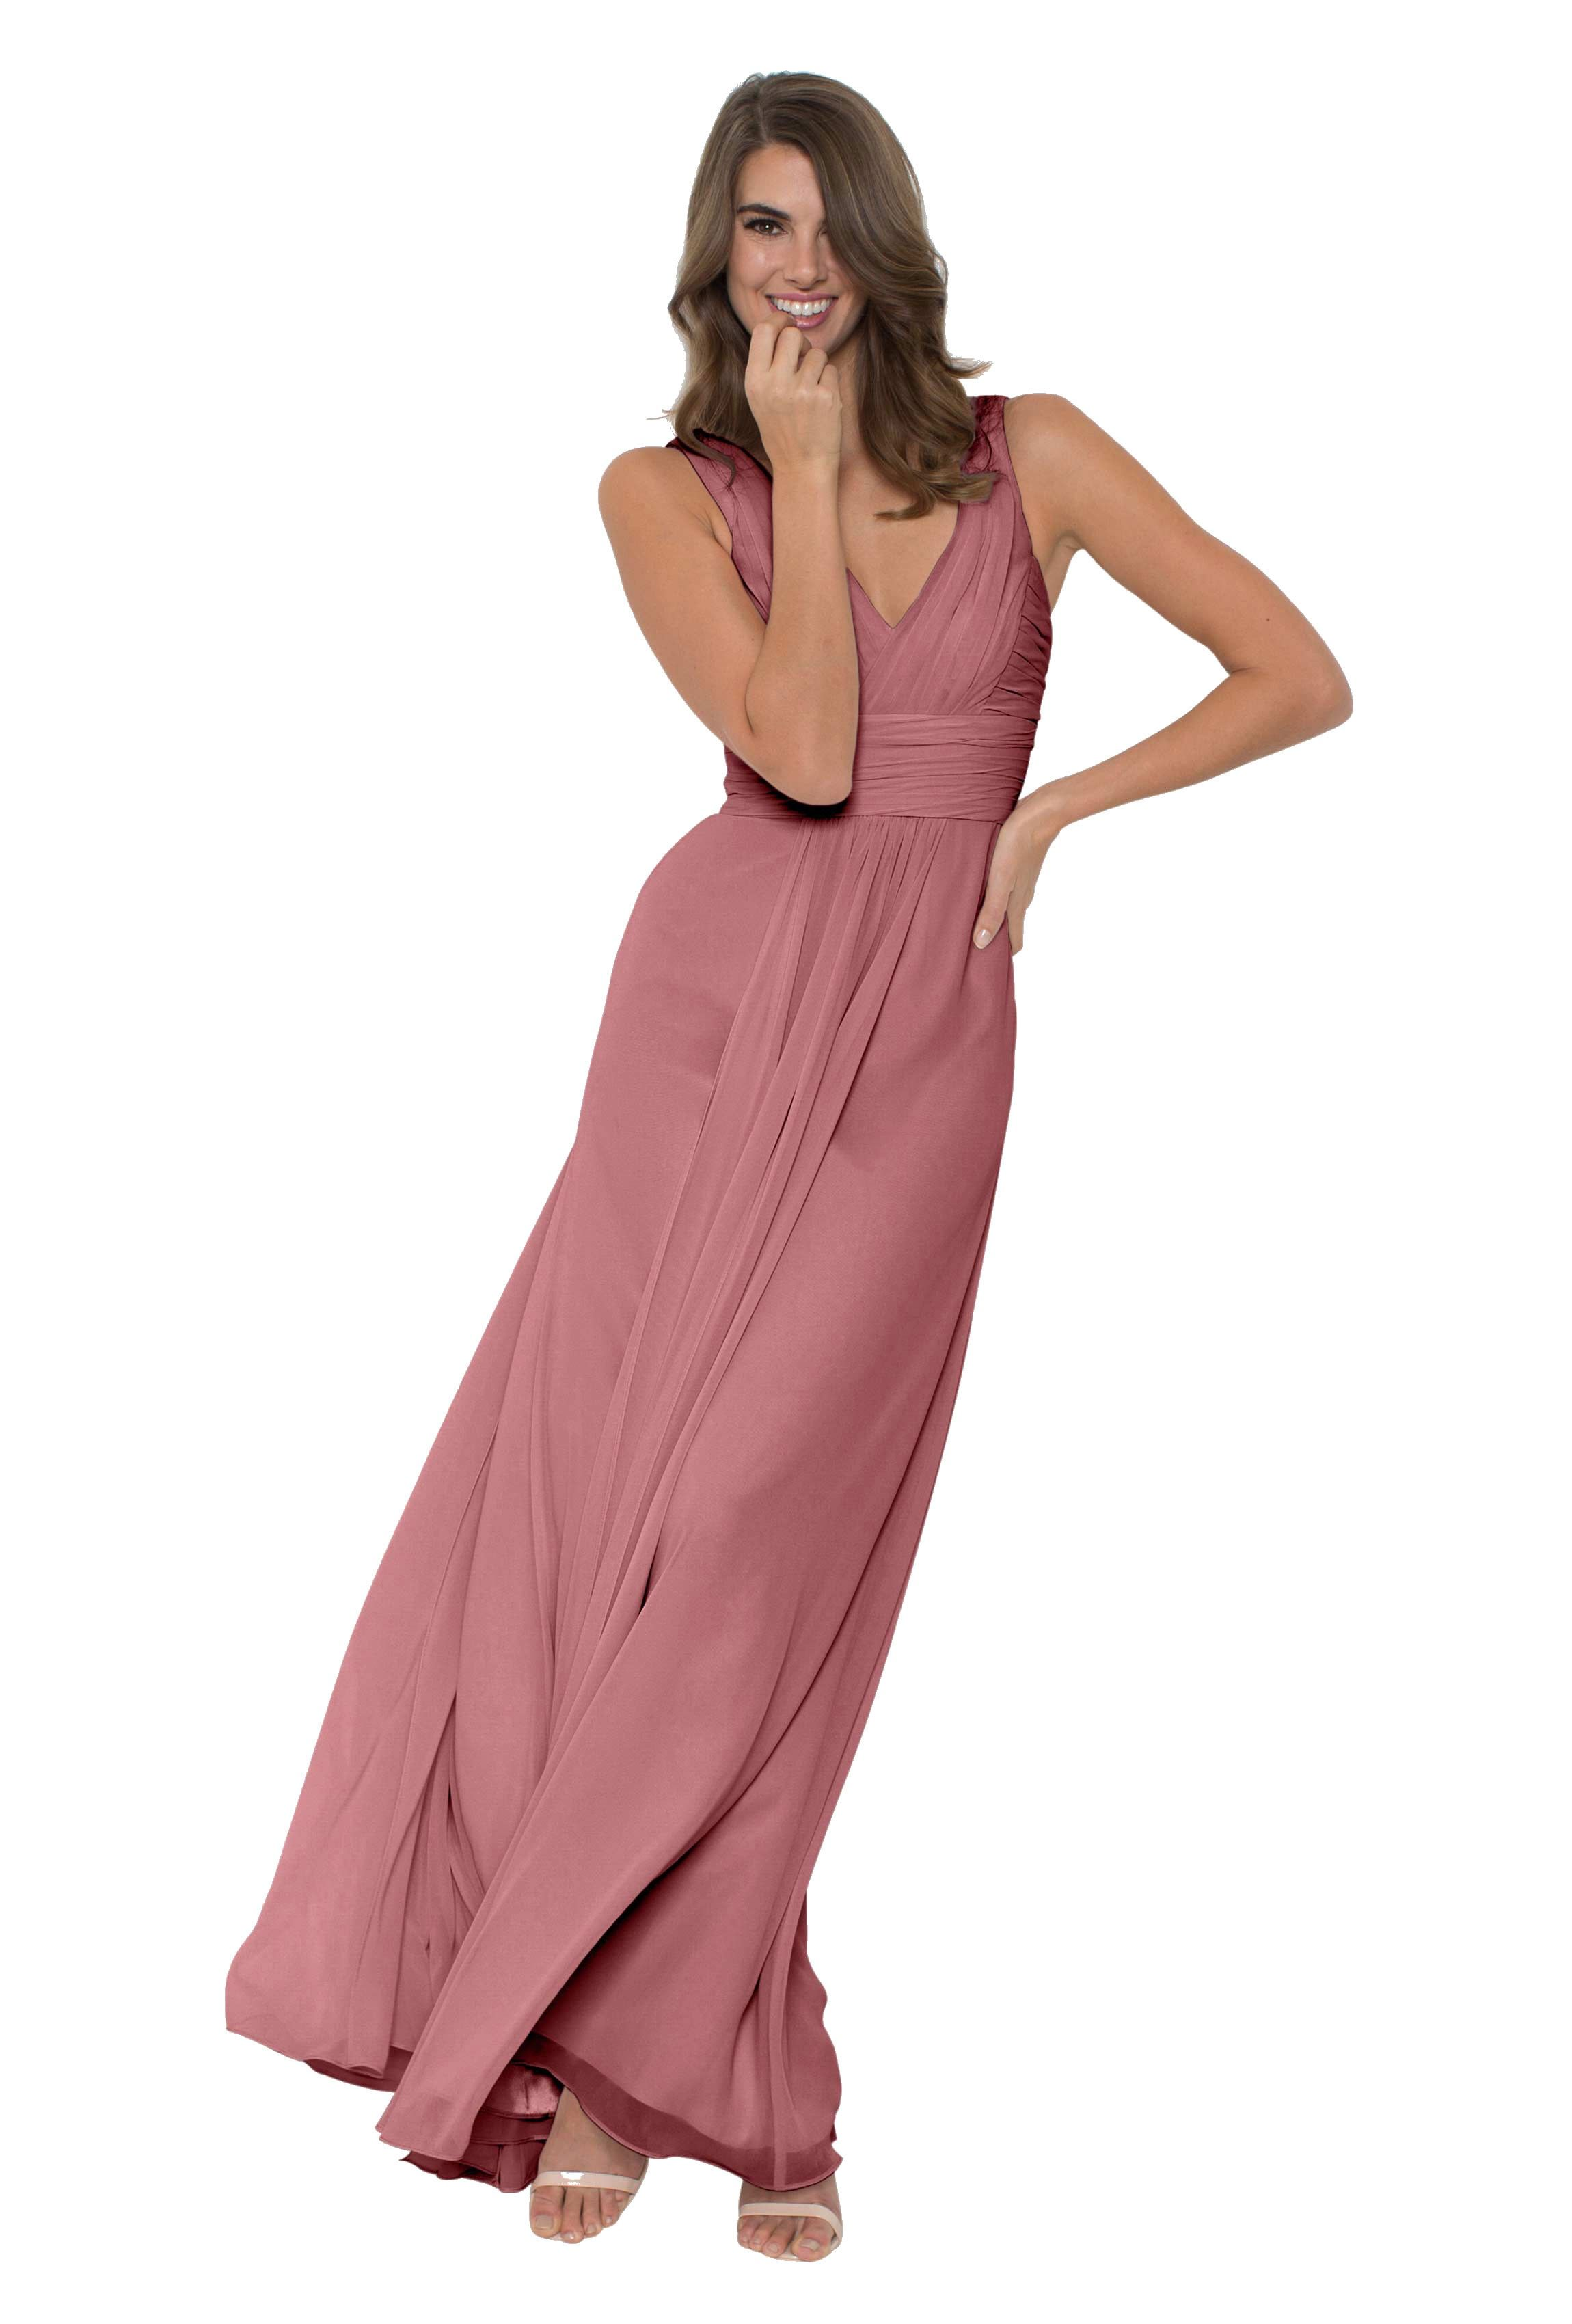 Monique Lhuillier Rebecca | Chiffon bridesmaid dresses, Bridal ...